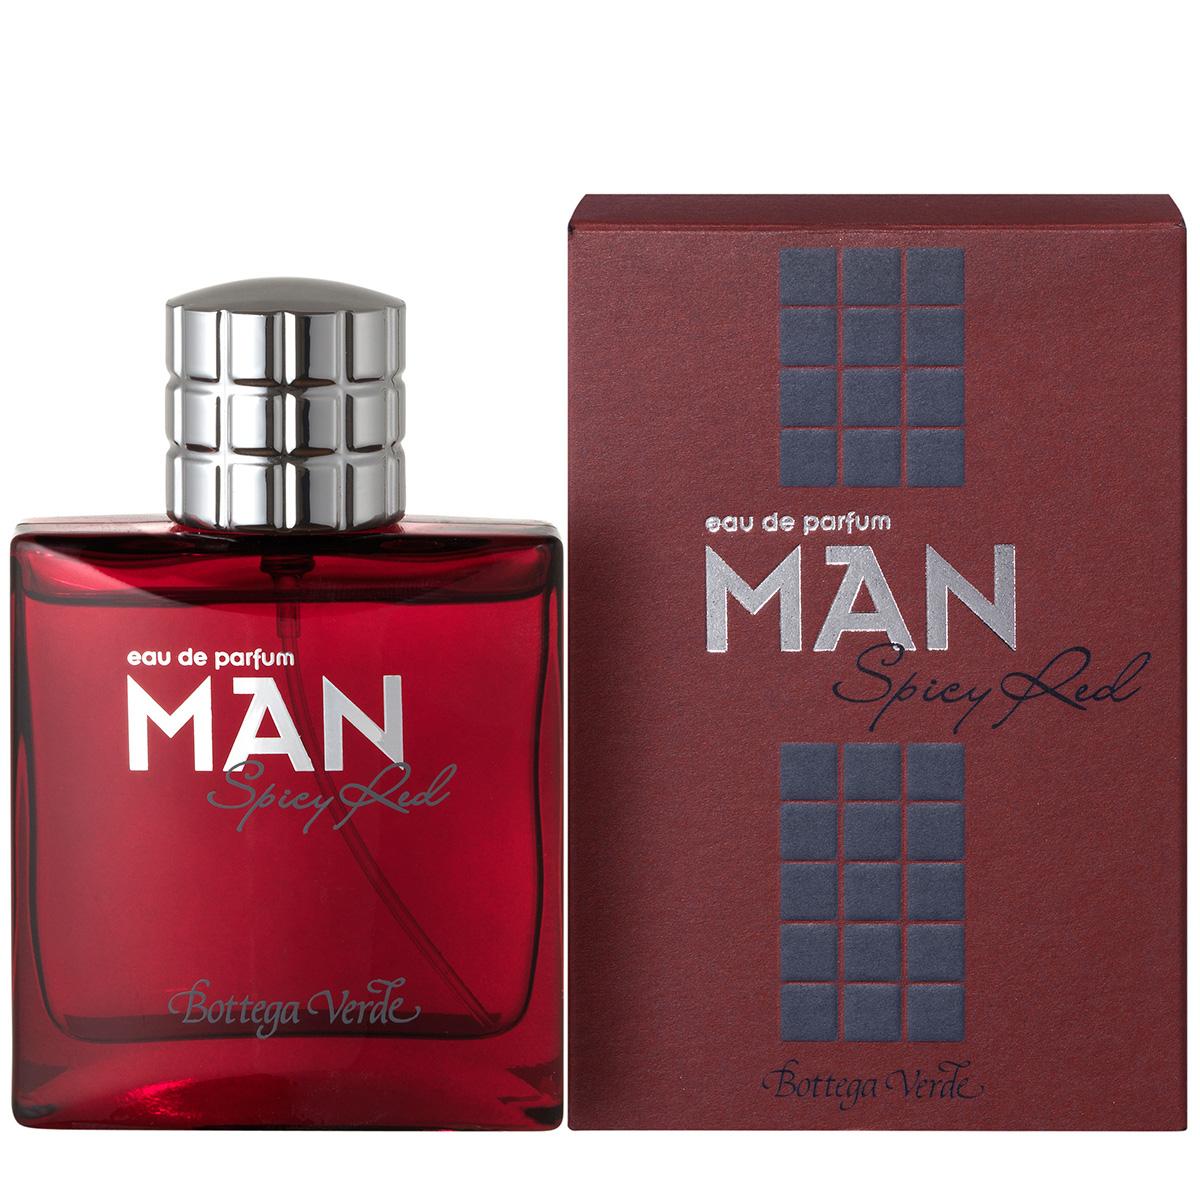 Apa de parfum Spicy Red - Man, 50 ML